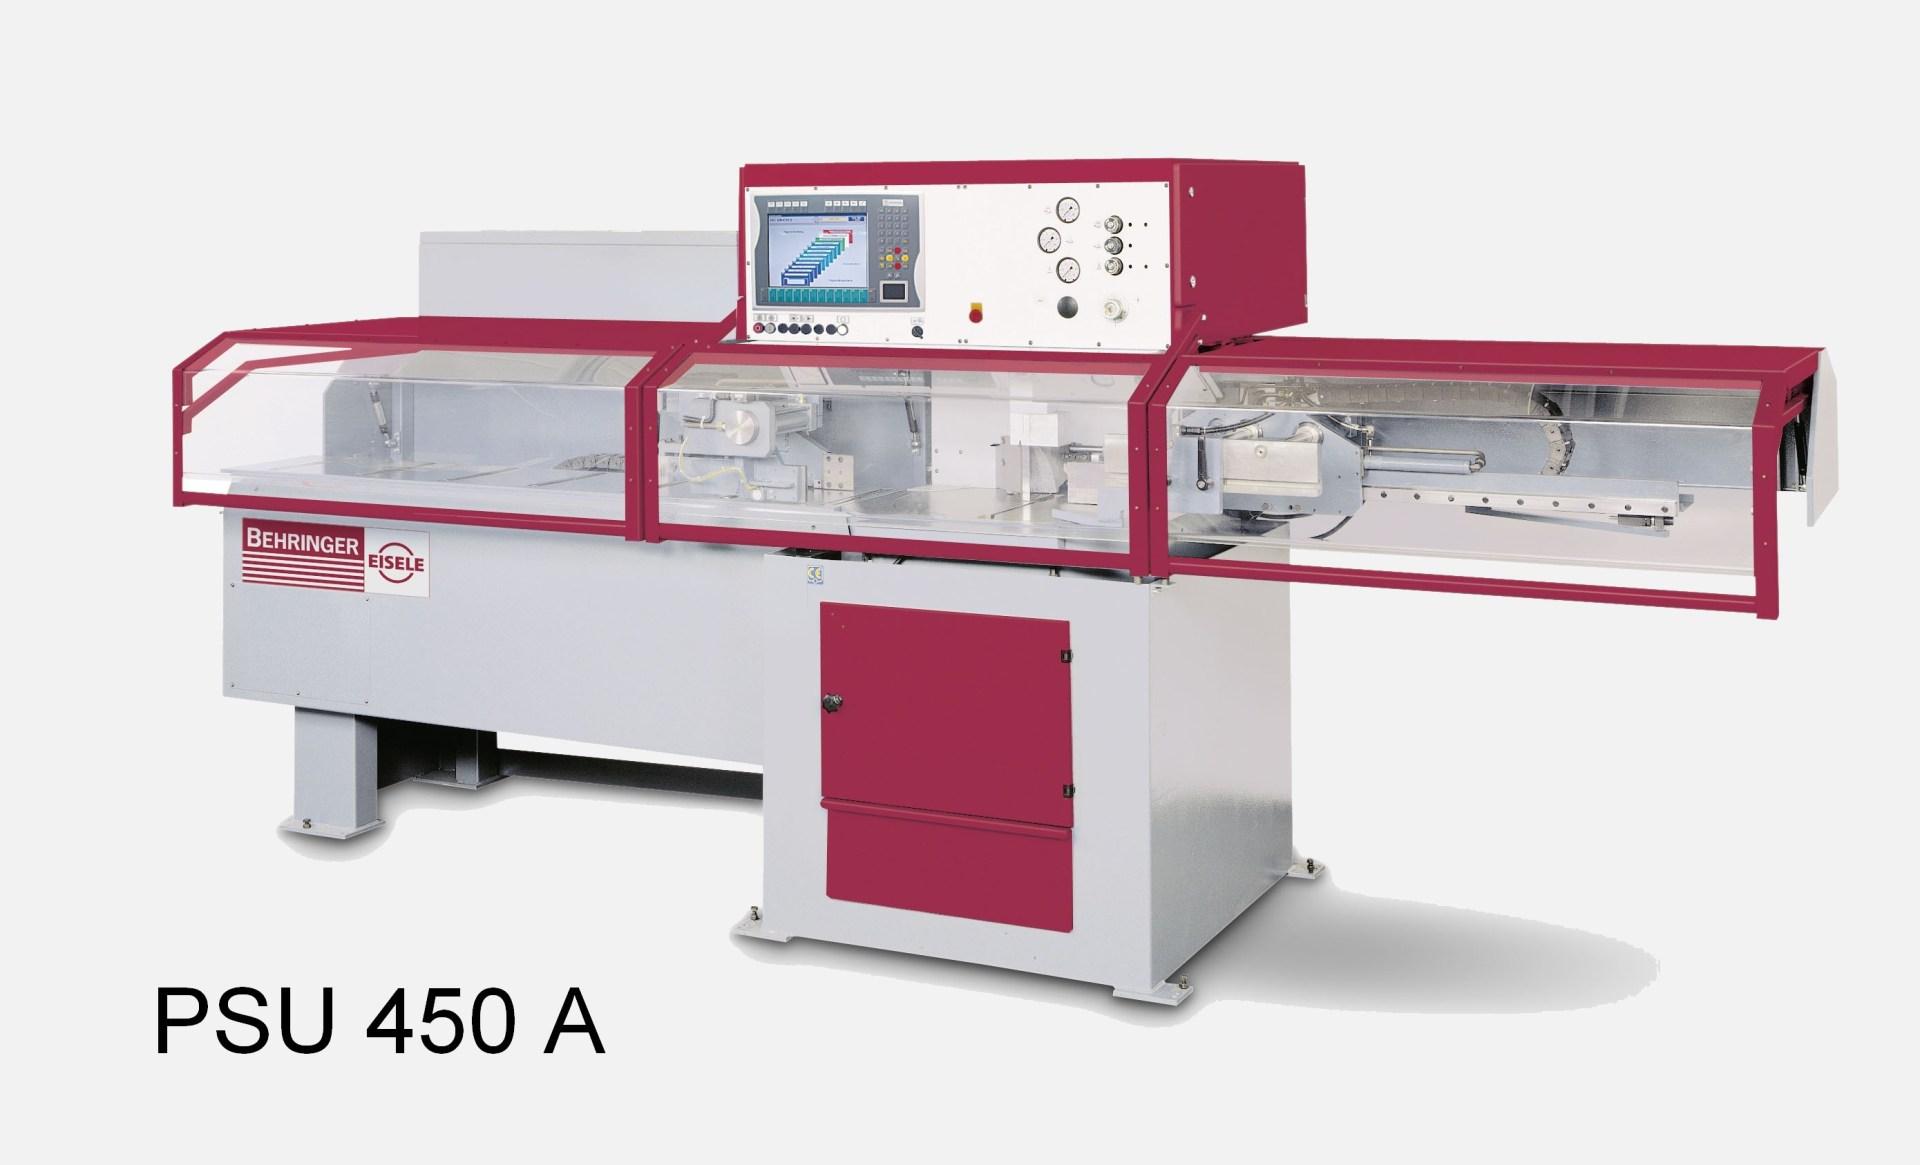 PSU450A